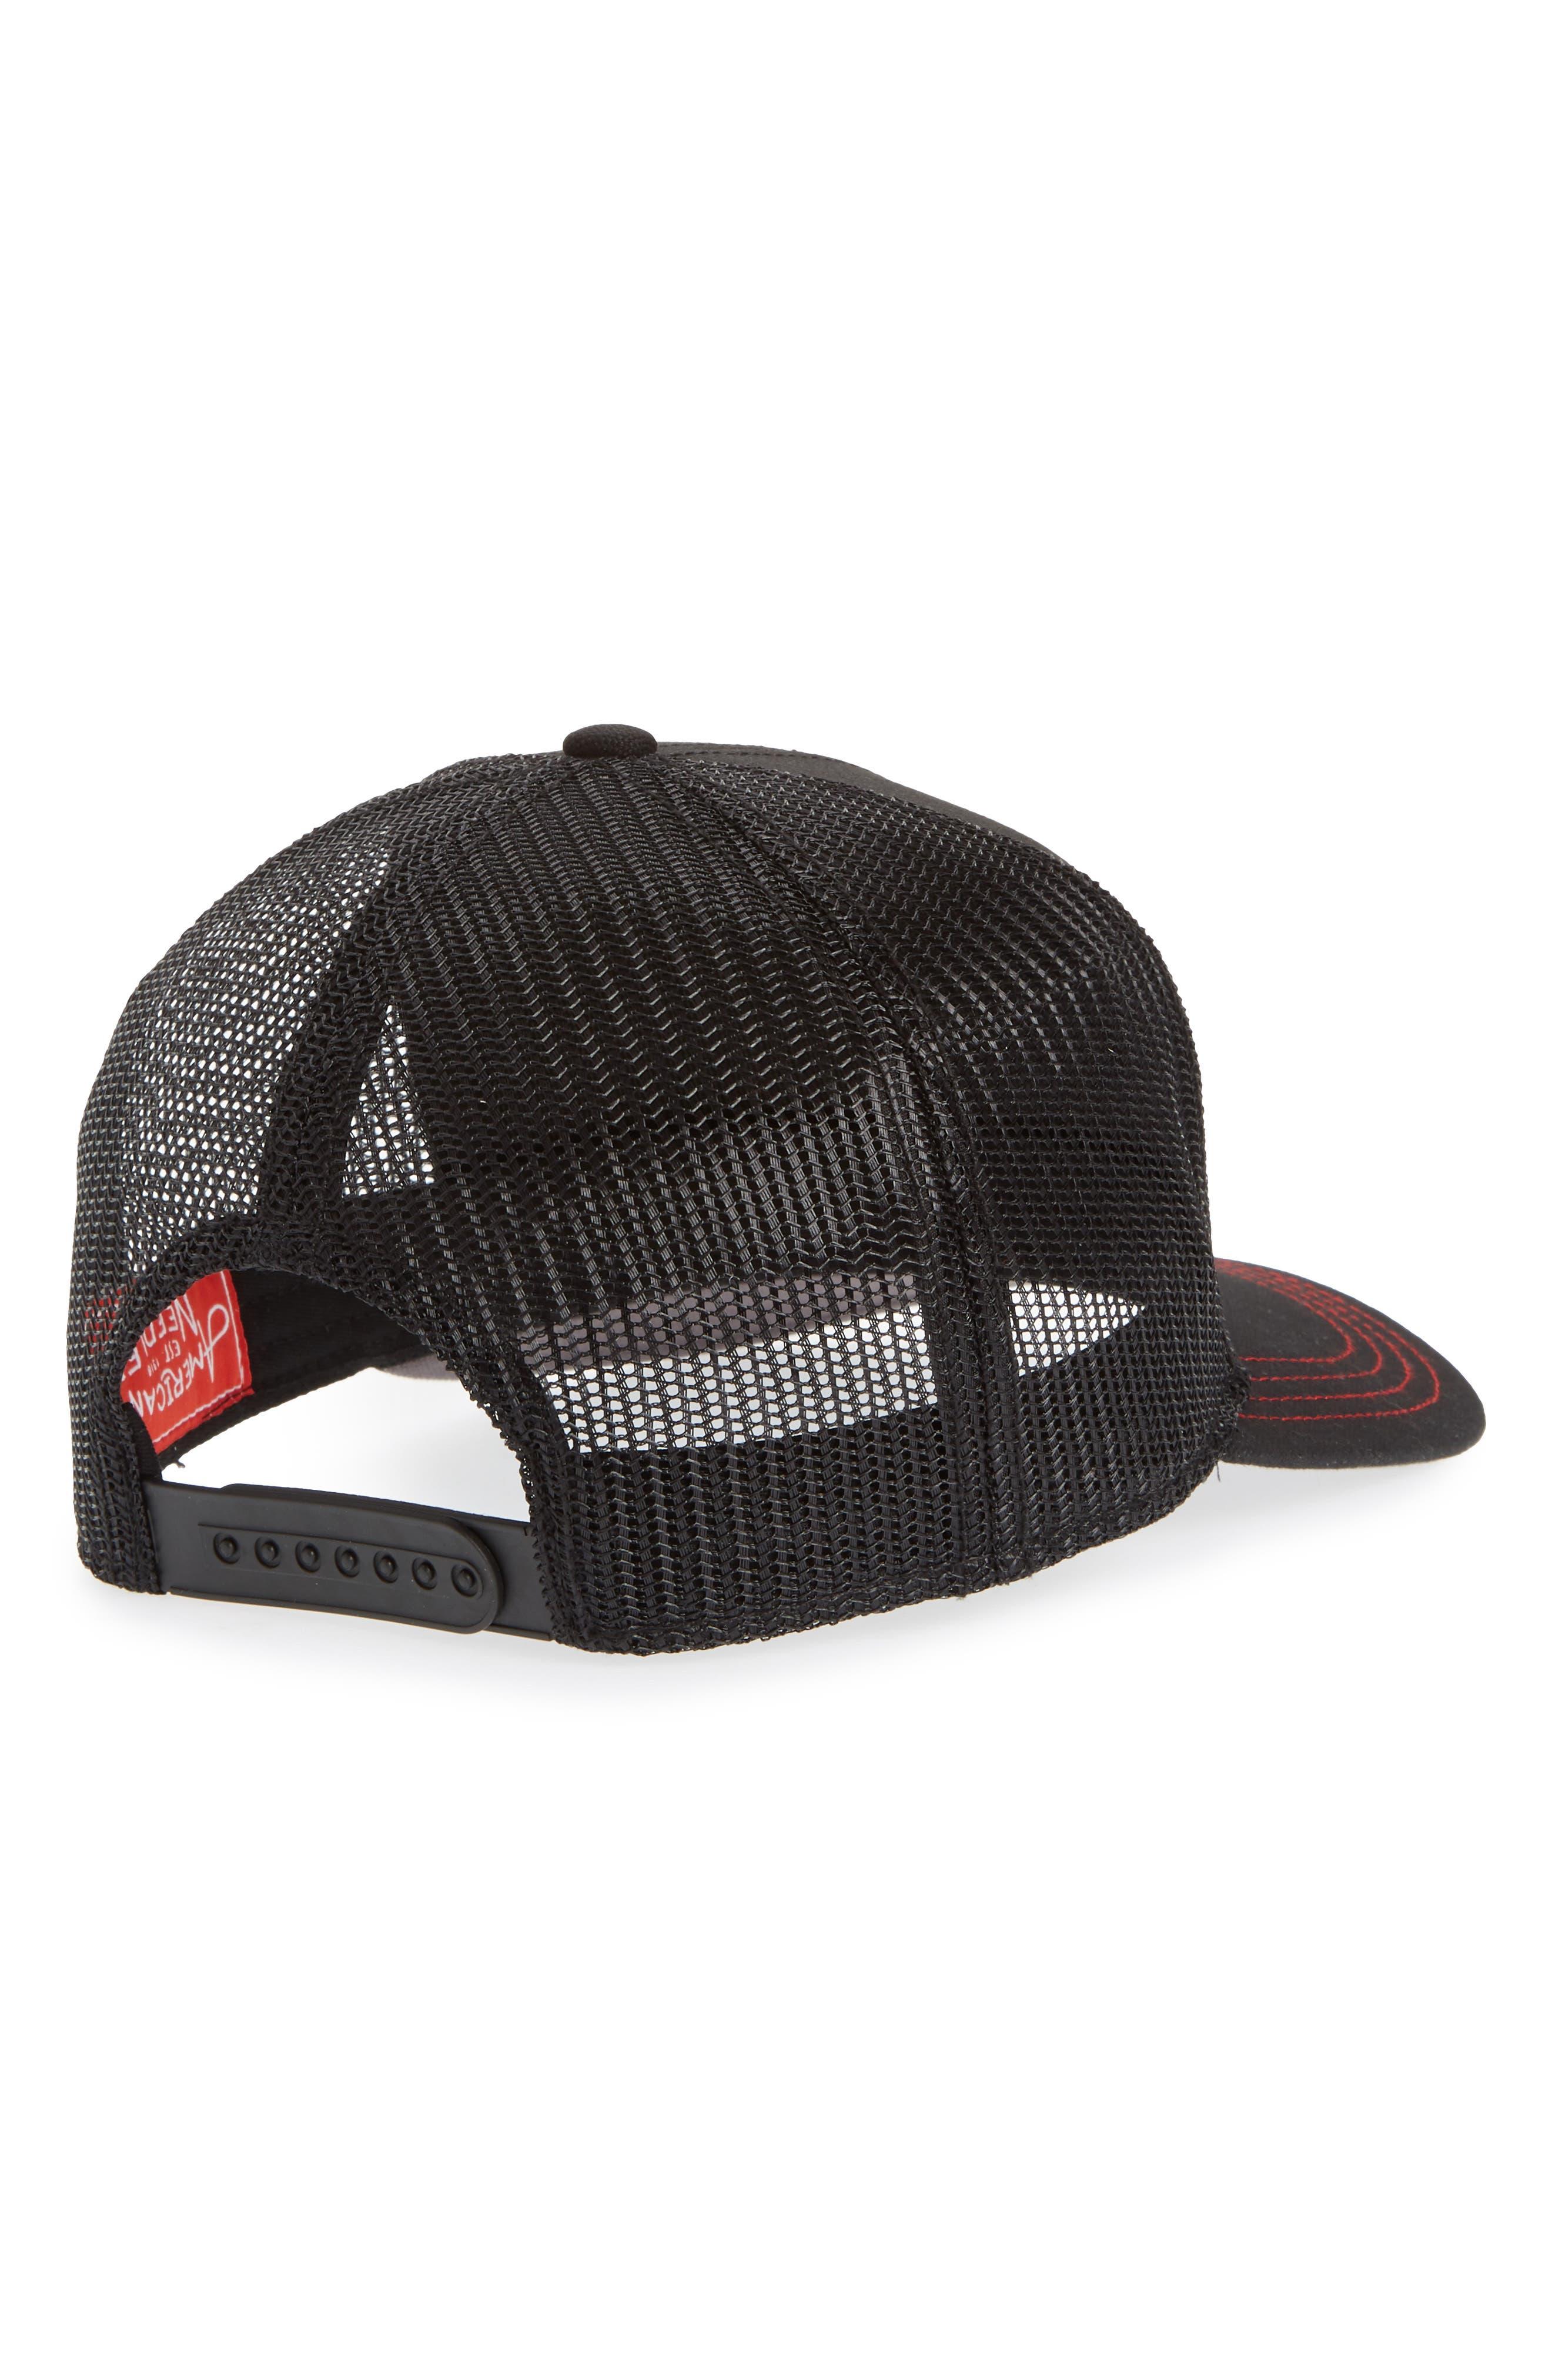 Valin KISS Trucker Hat,                             Alternate thumbnail 2, color,                             001